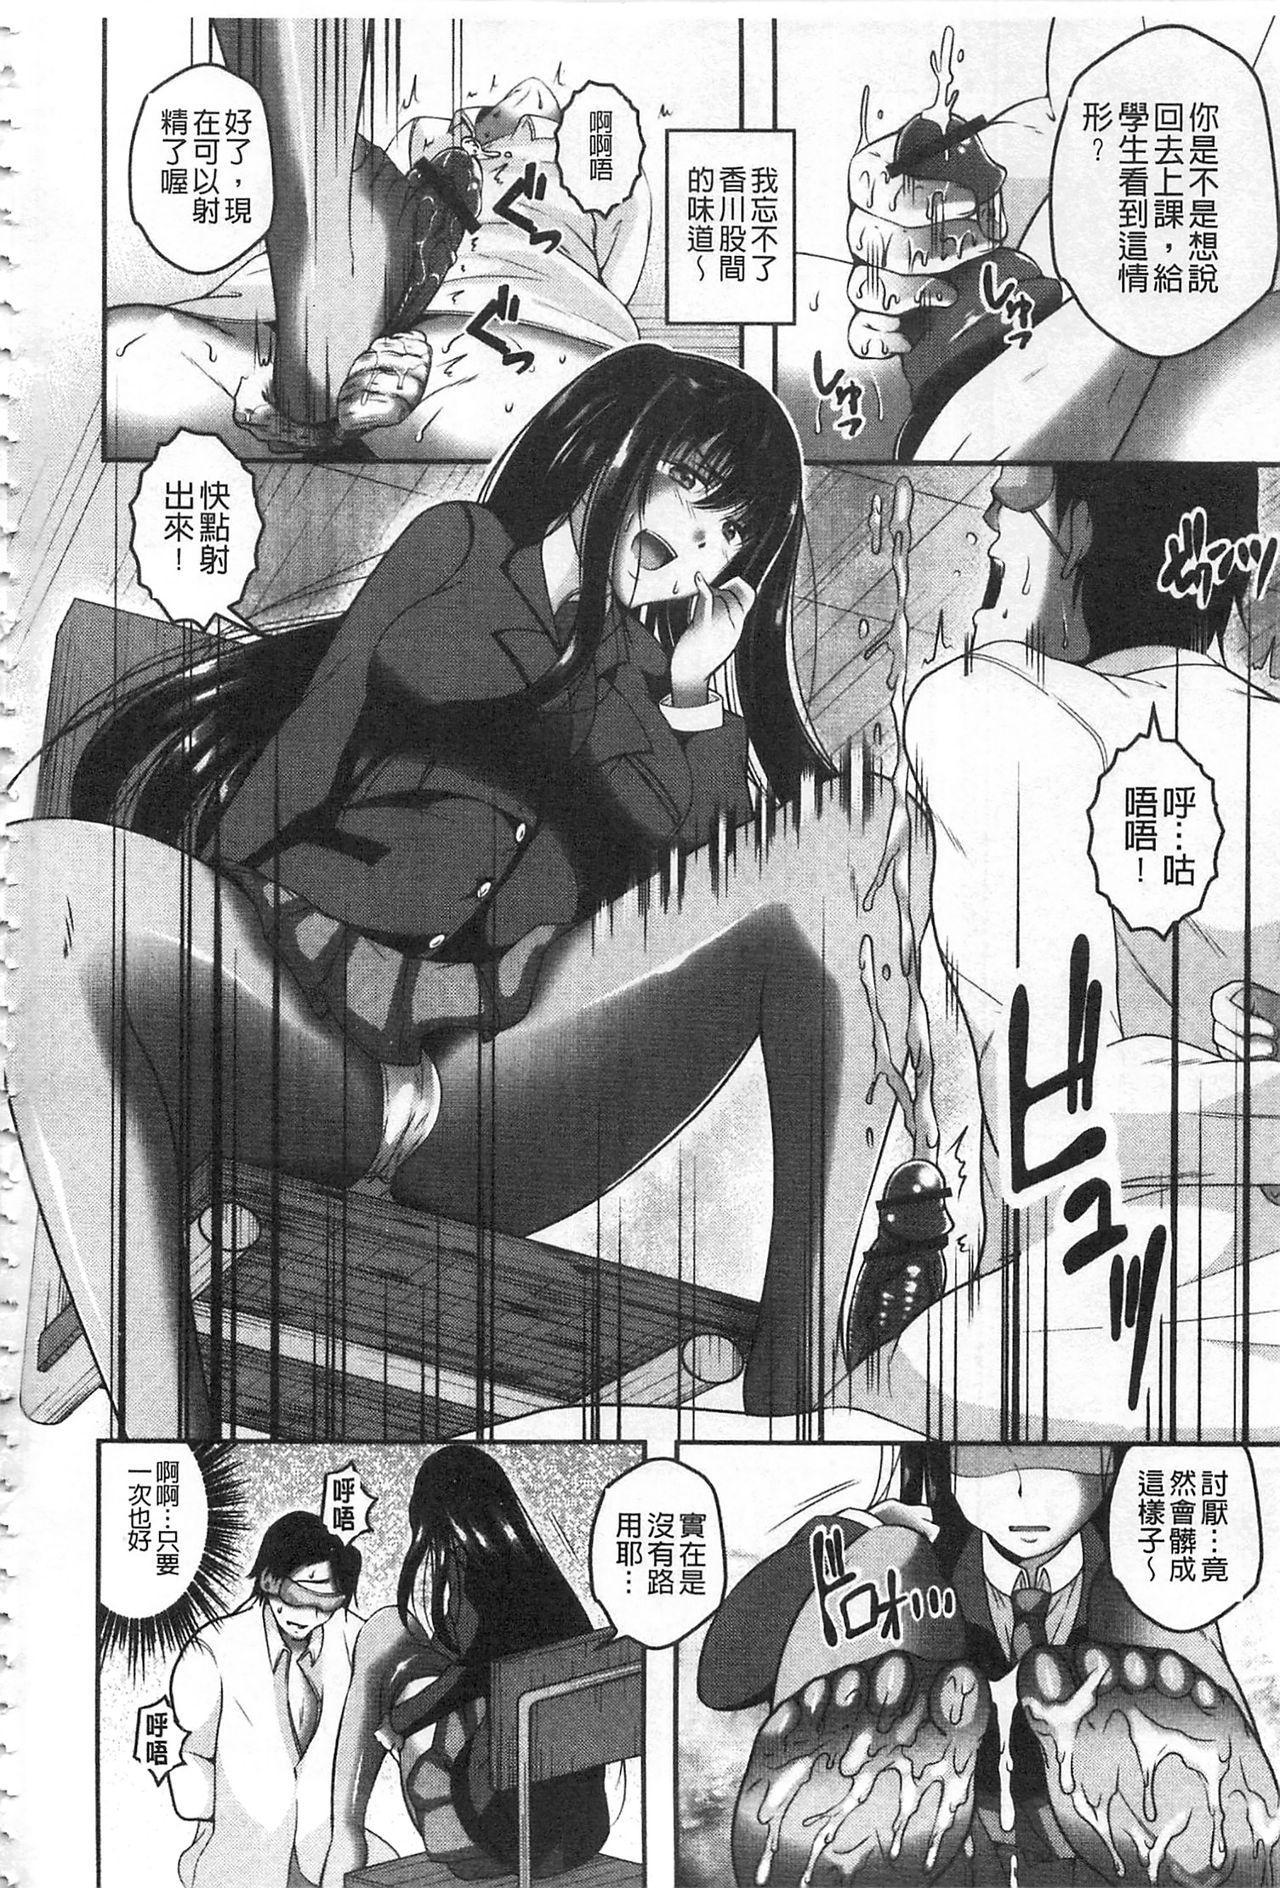 Kanjuku Otome no Odoshikata | 姦熟乙女的脅迫法 171